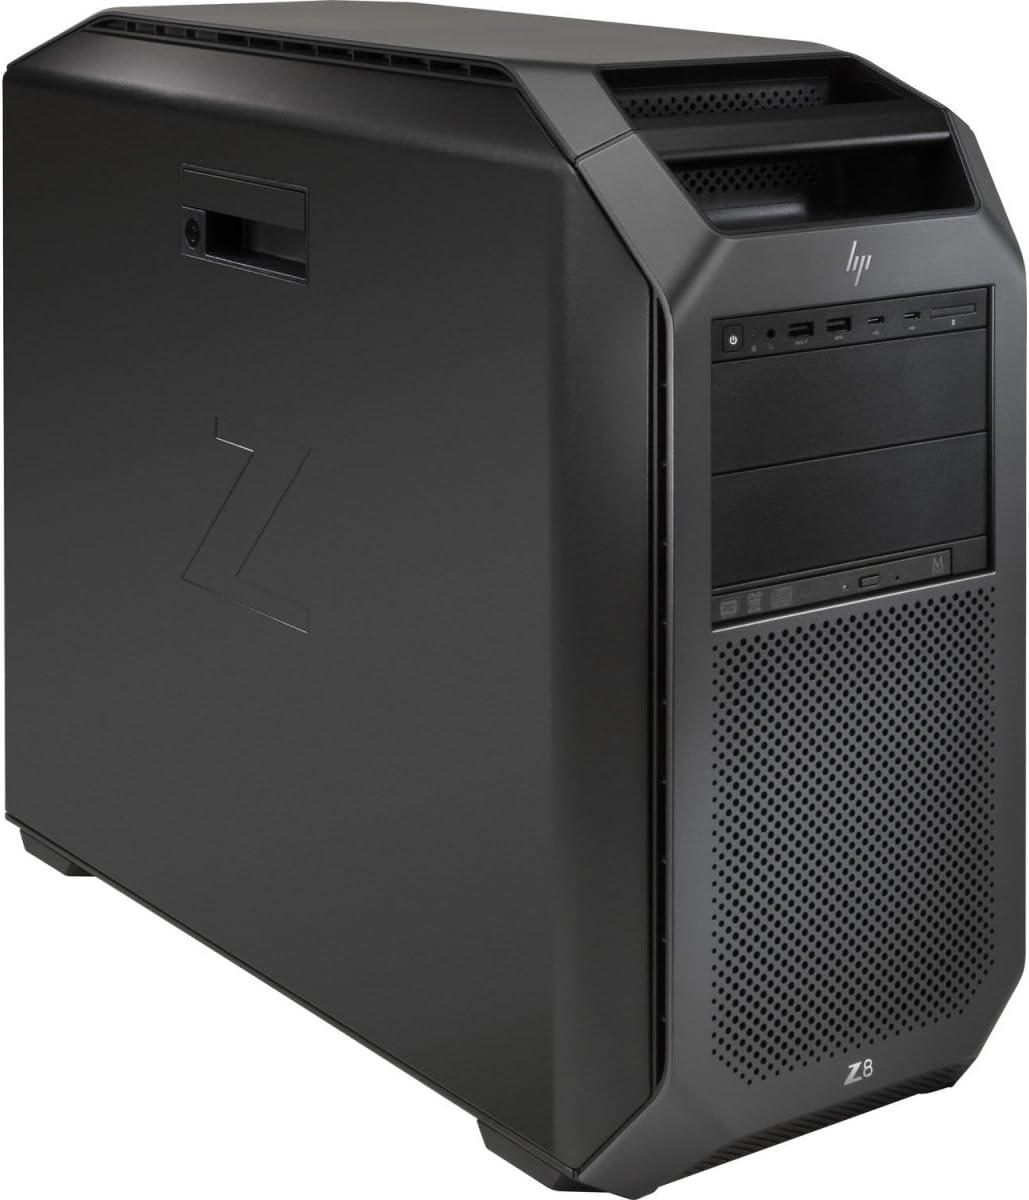 HP 1WU28UT Workstation Z8 G4 - MT - 5U - 1 x Xeon Silver 4108/1.8 GHz - RAM 8 GB - HDD 1 TB - DVD-Writer - no Graphics - GigE